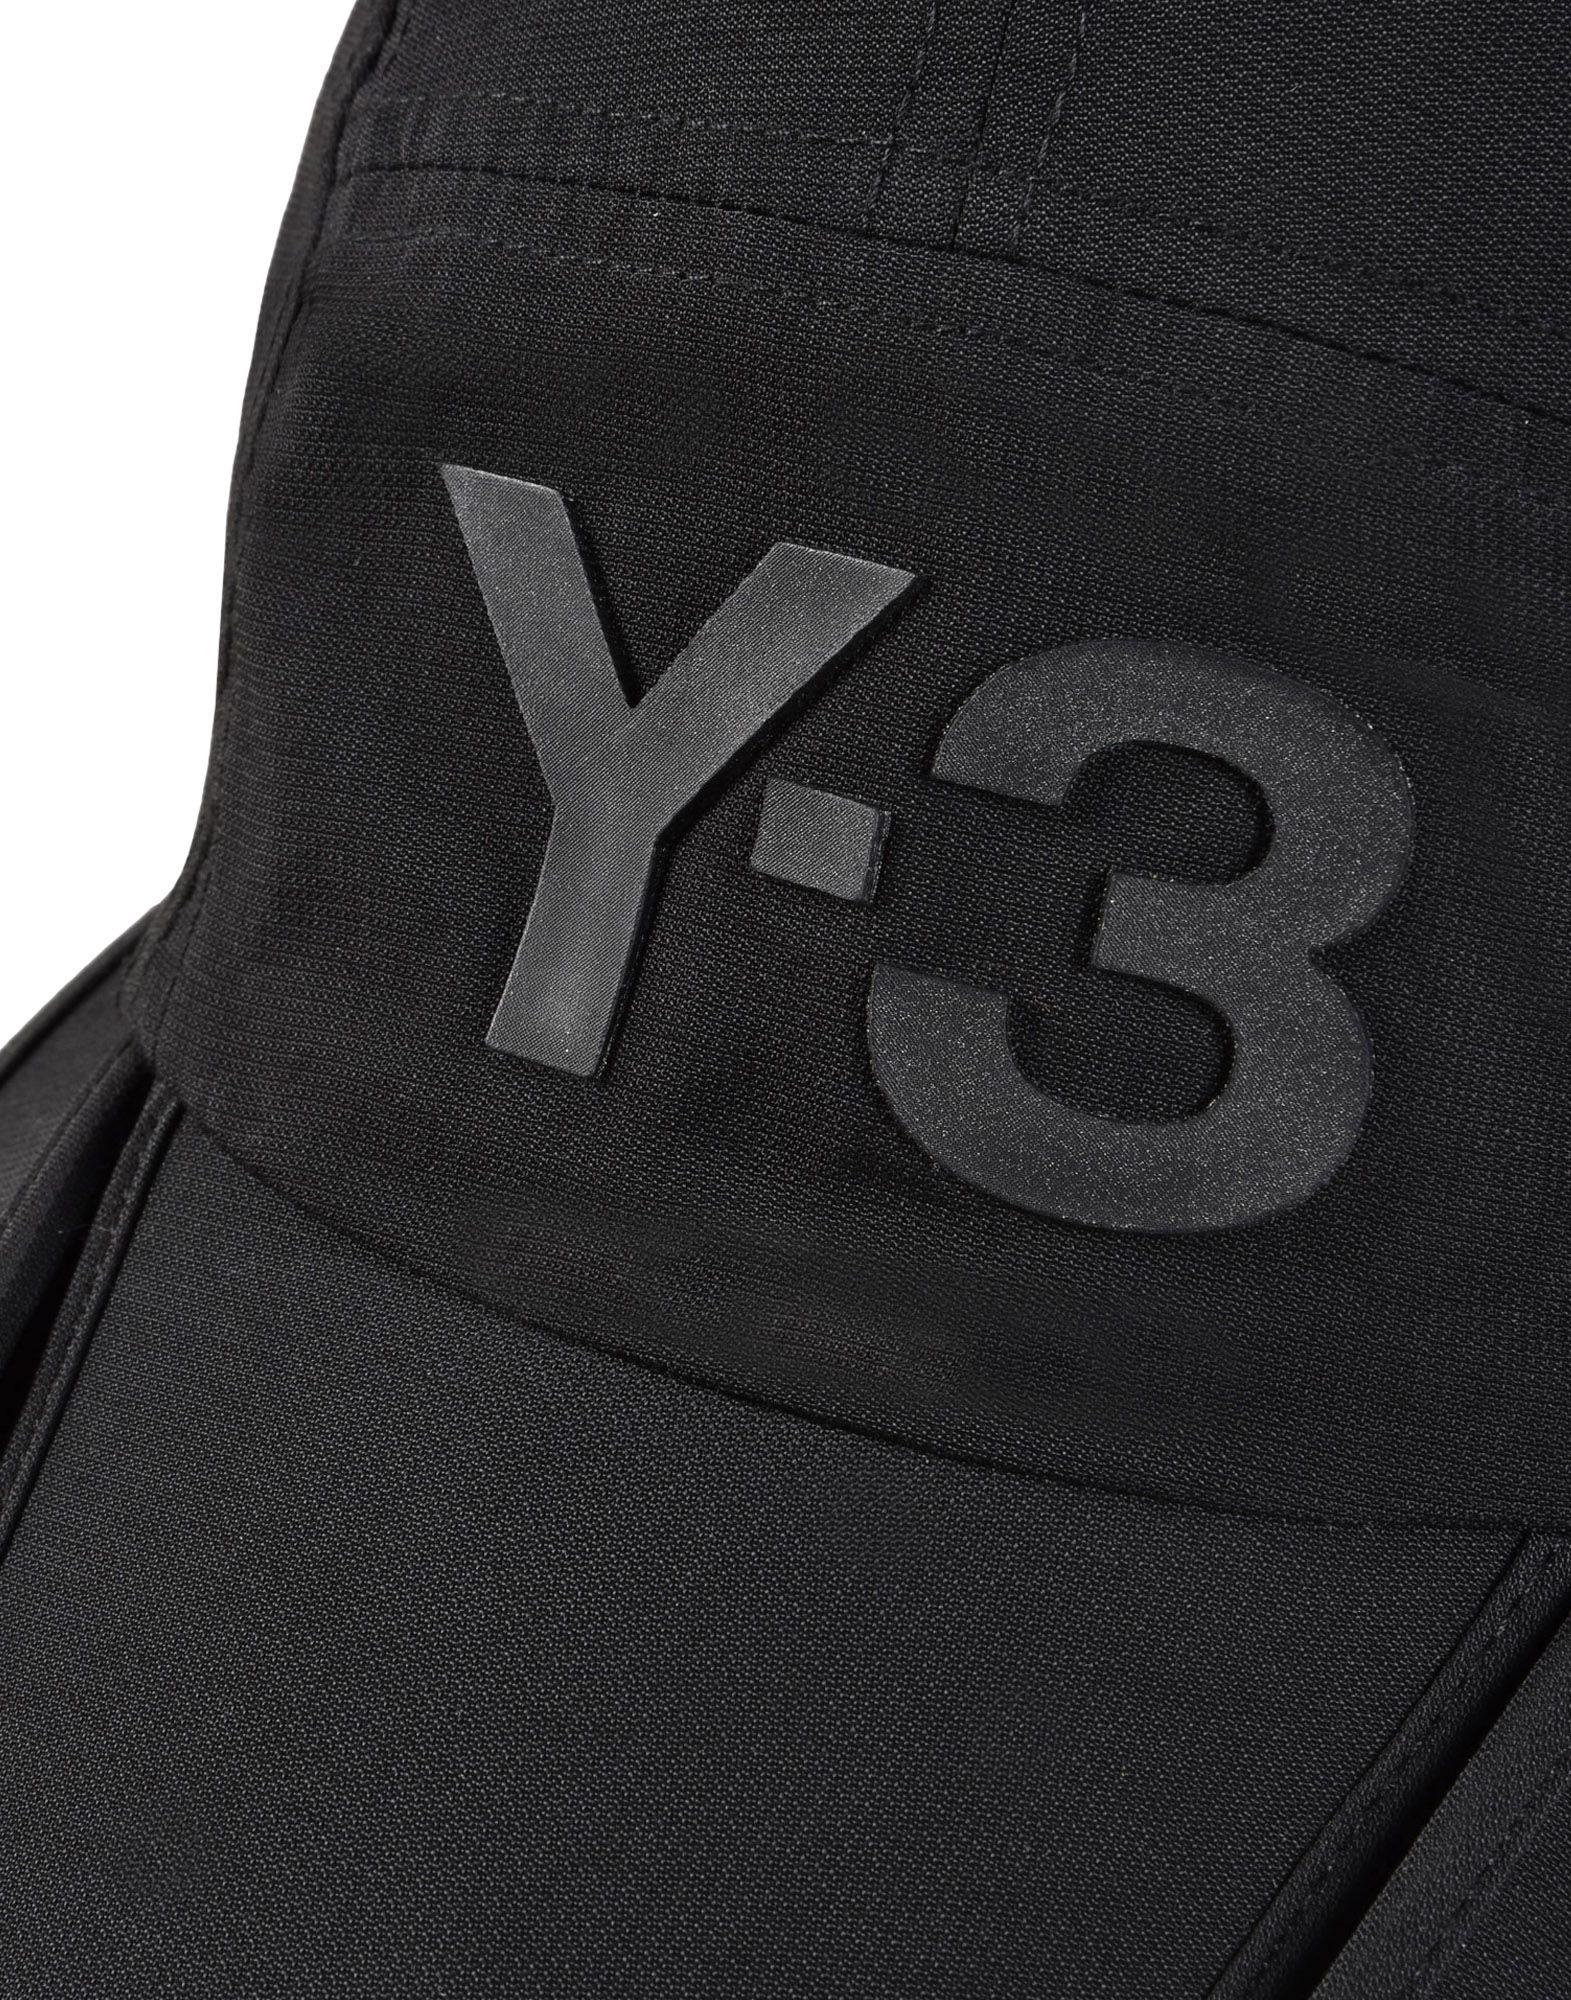 Y-3 BLACK FOLD CAP OTHER ACCESSORIES unisex Y-3 adidas